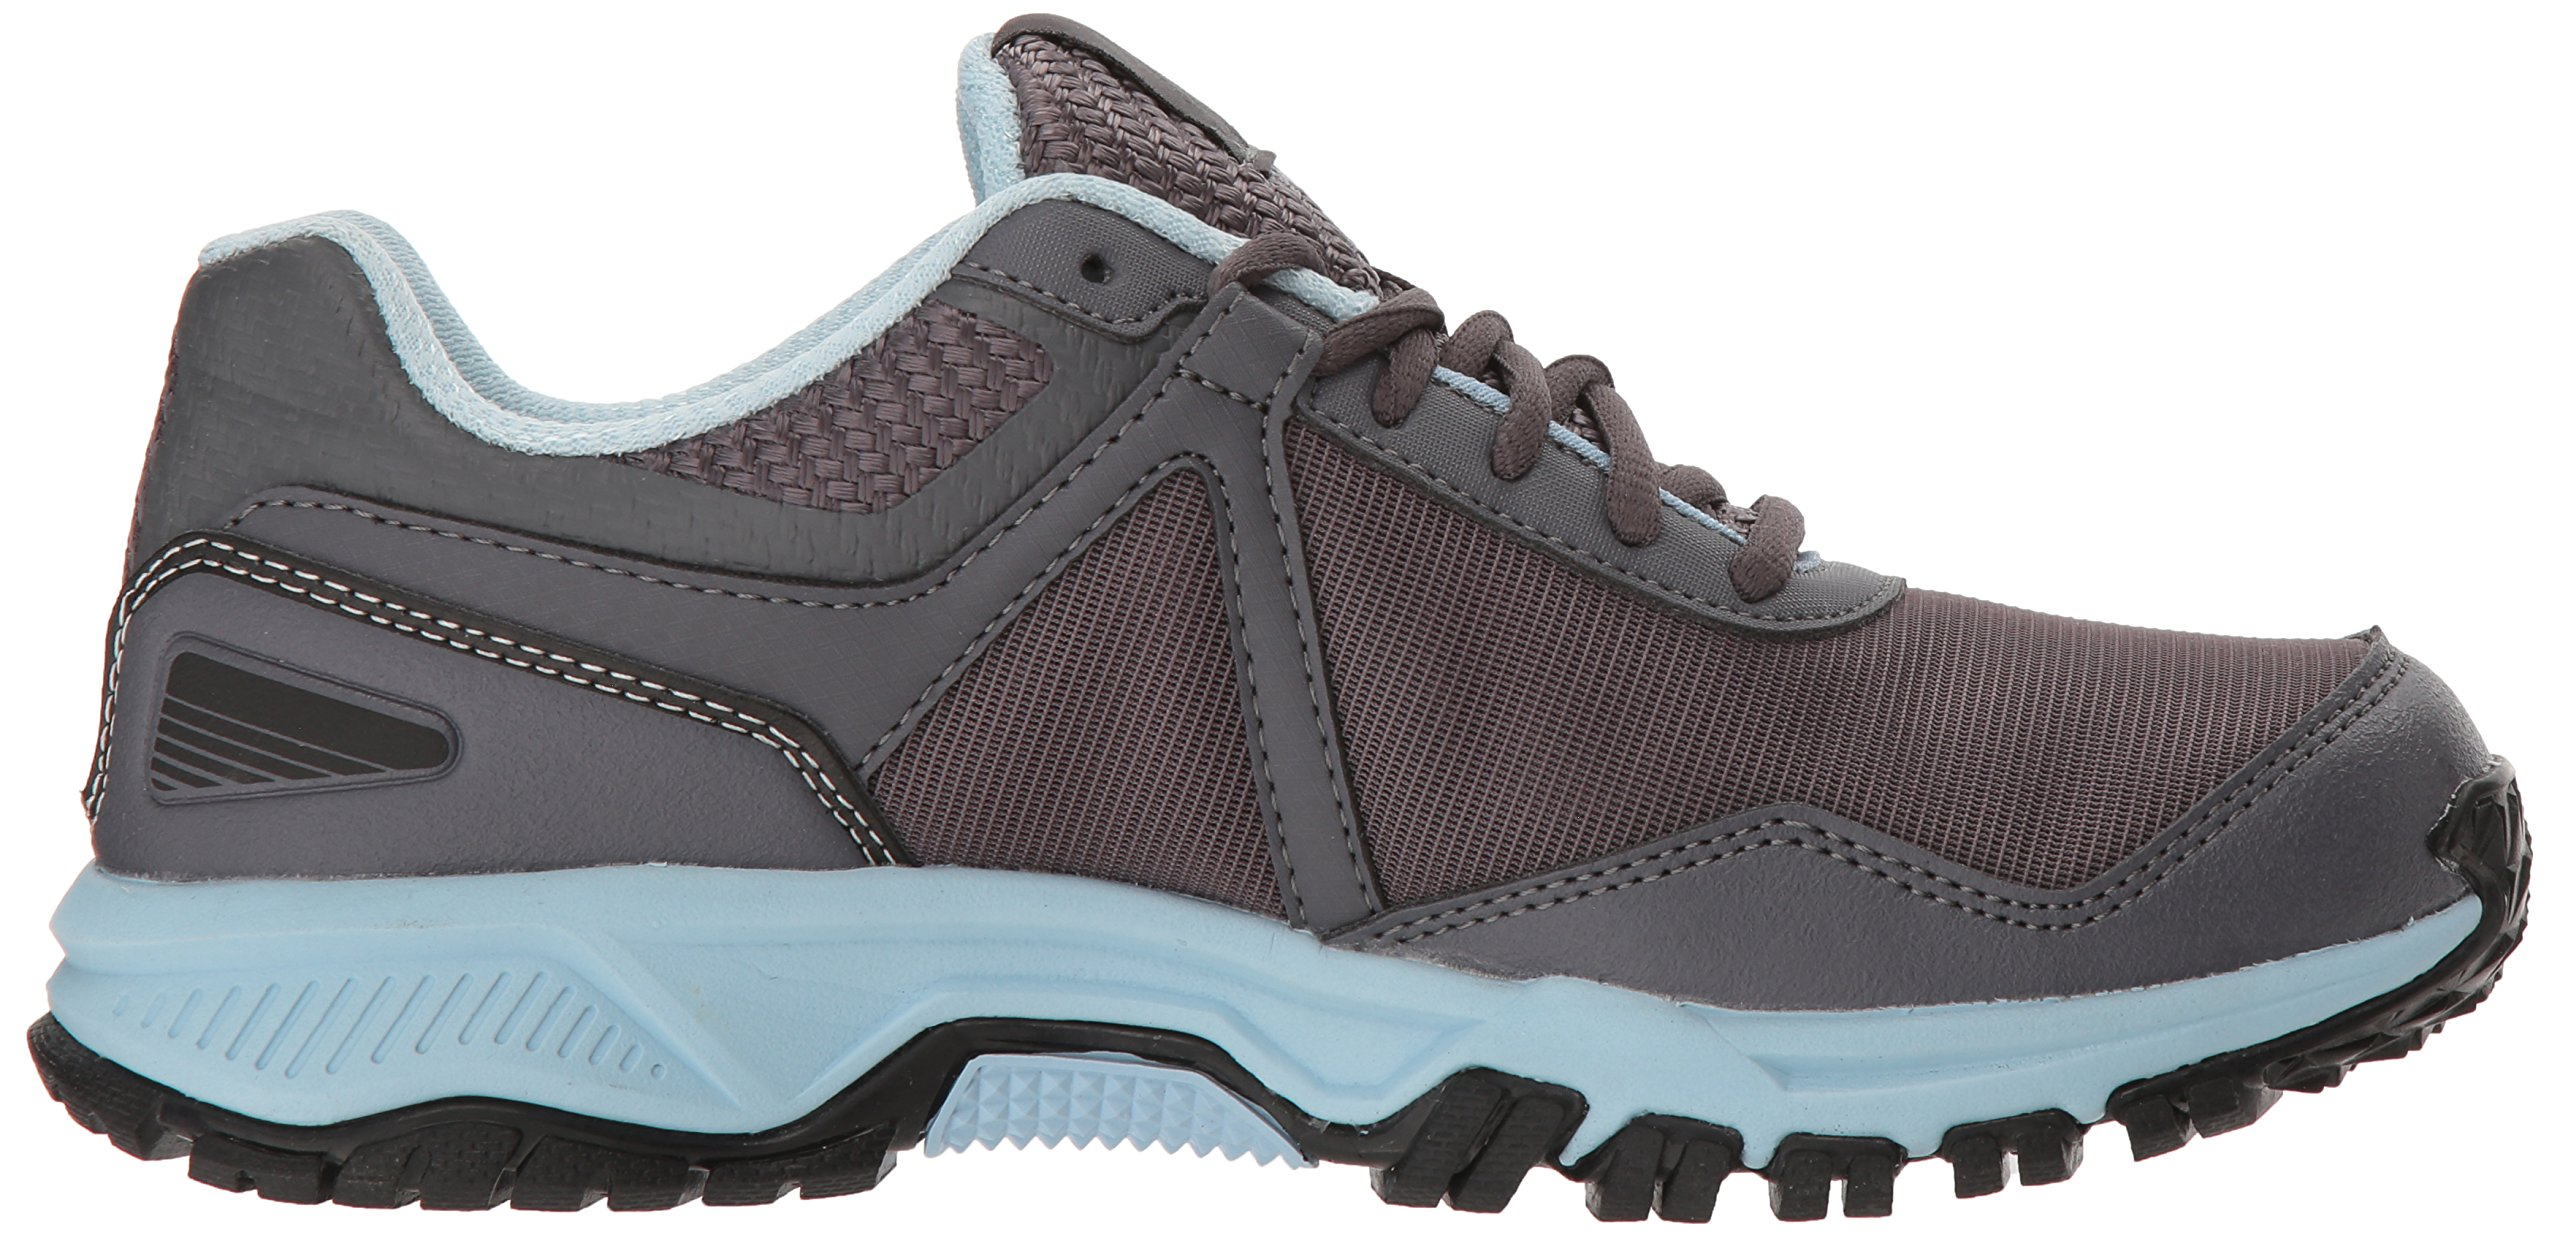 Reebok Women's Ridgerider Trail 3.0 Walking Shoe, ash Grey/Dreamy Blue/blac, 7.5 M US by Reebok (Image #6)